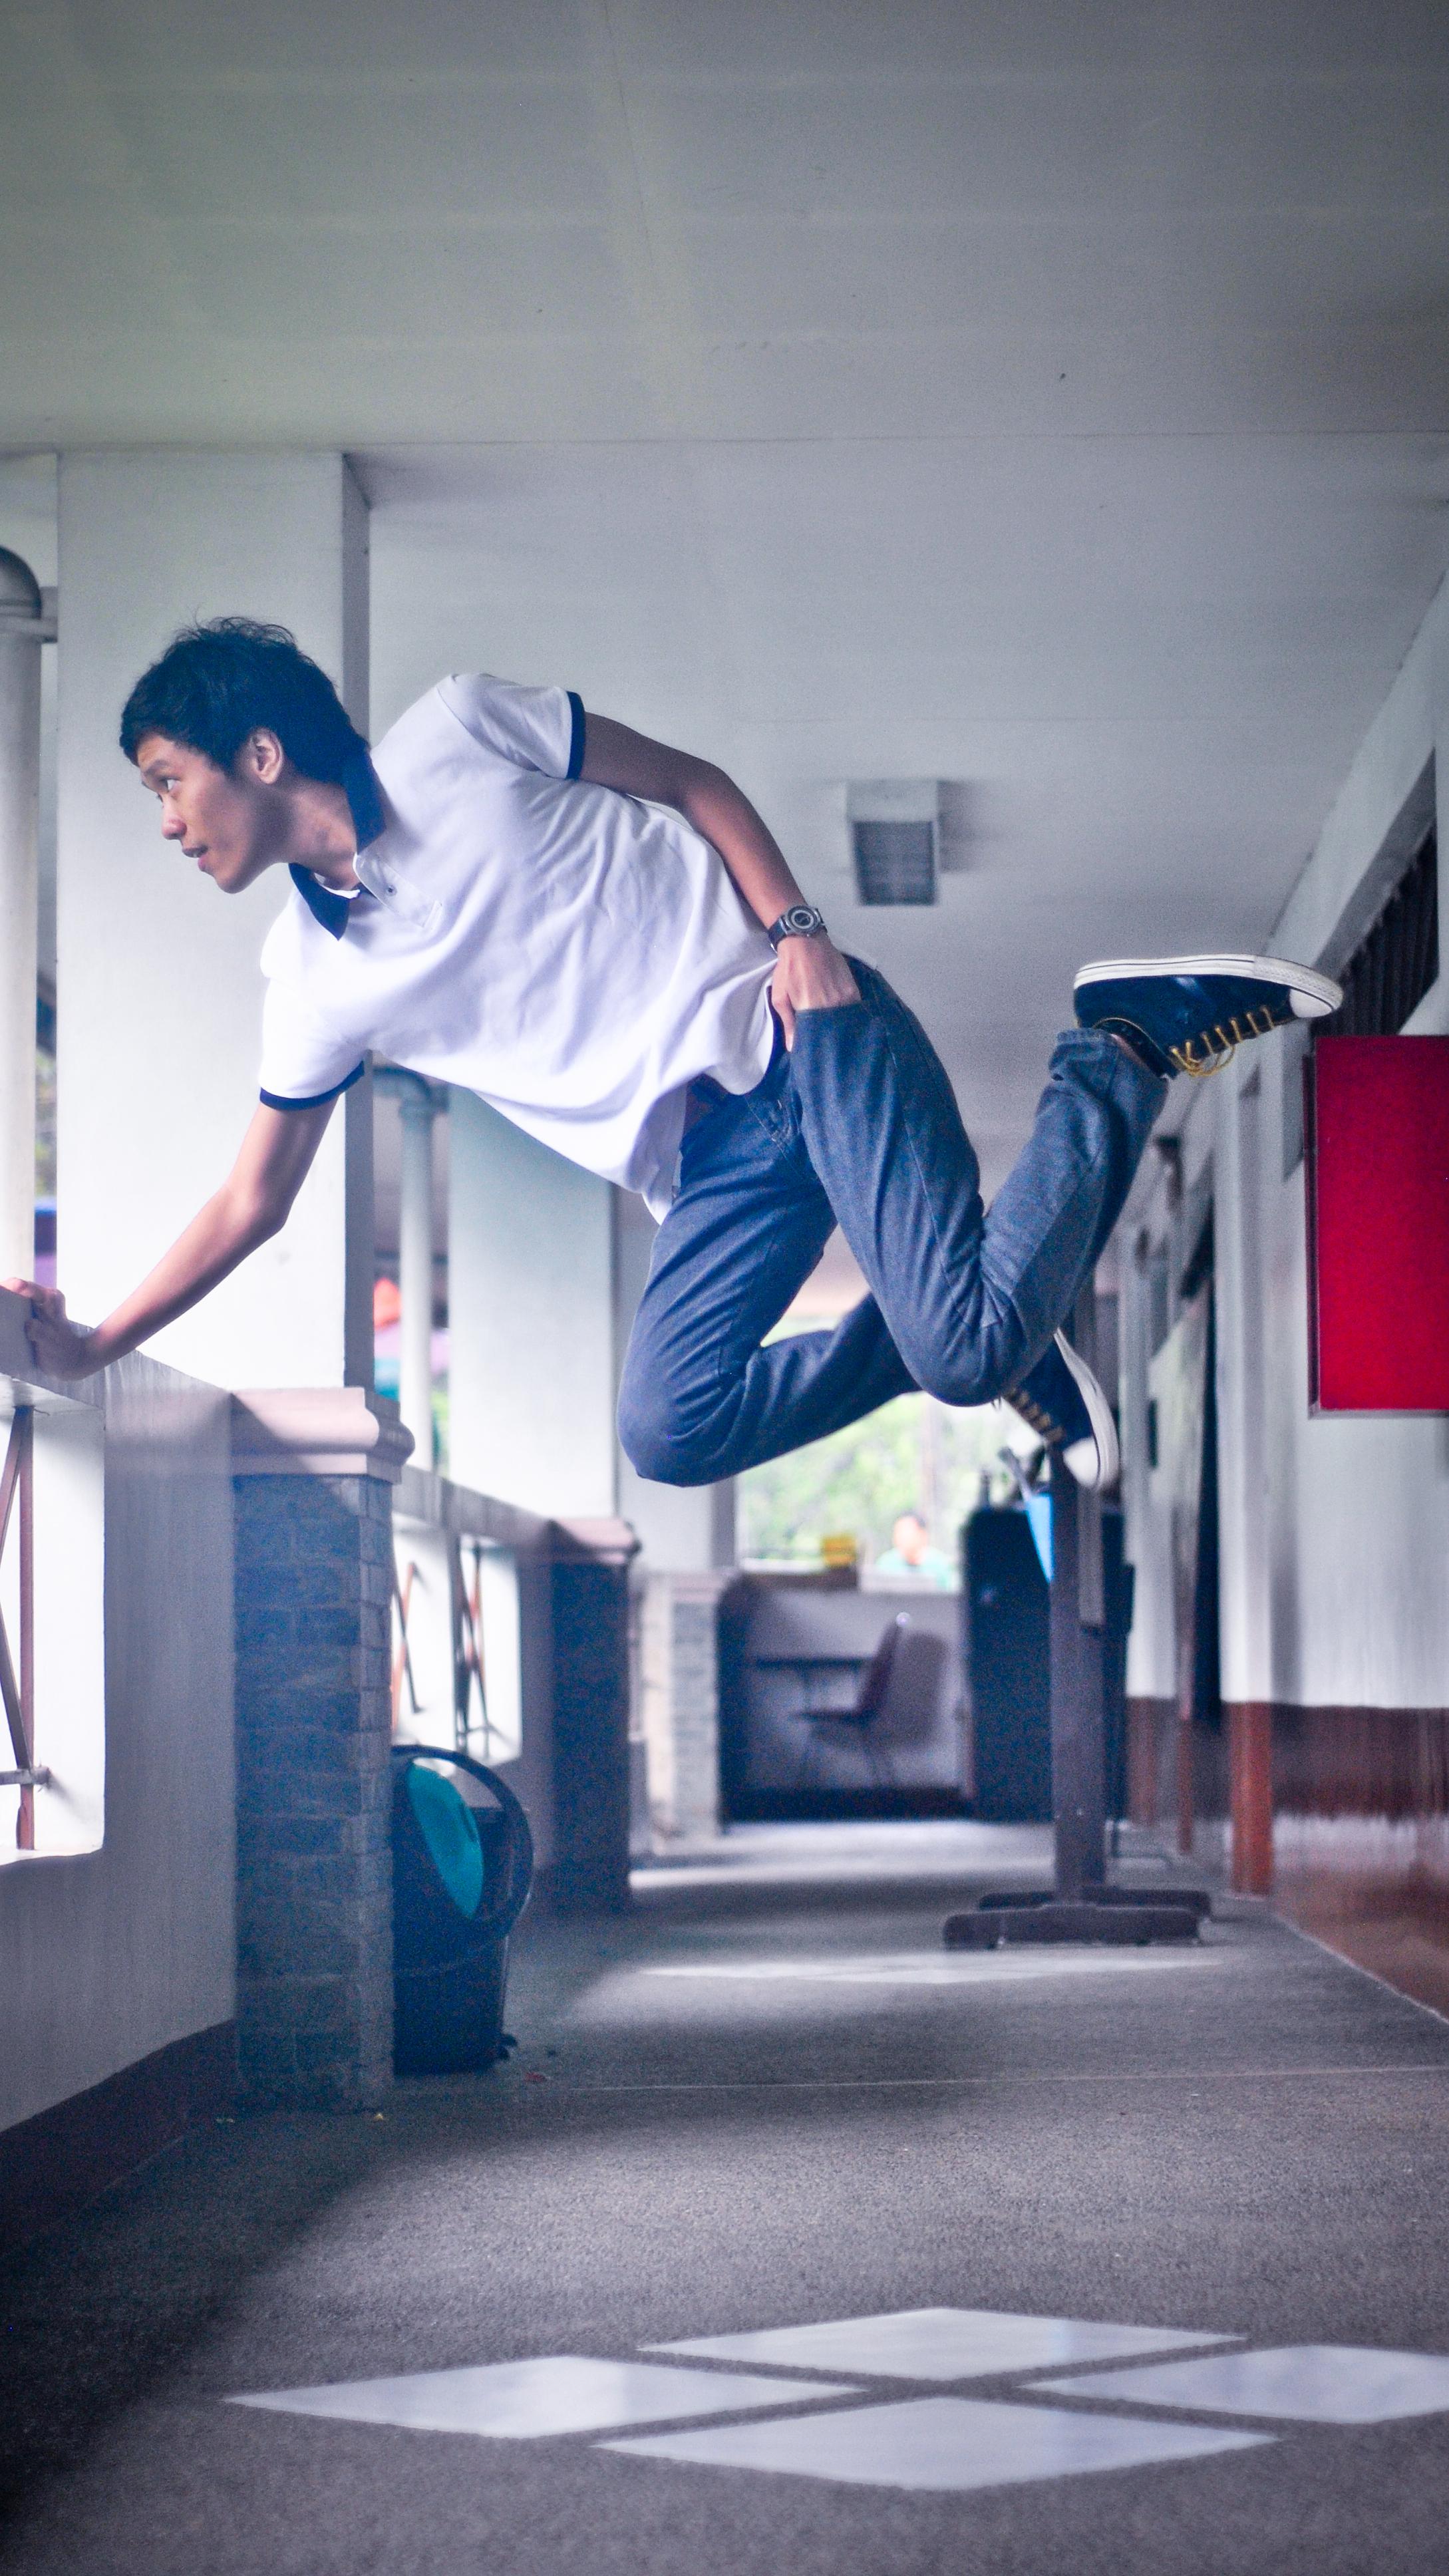 He didn't jump. He flew. by isangkilongkamera